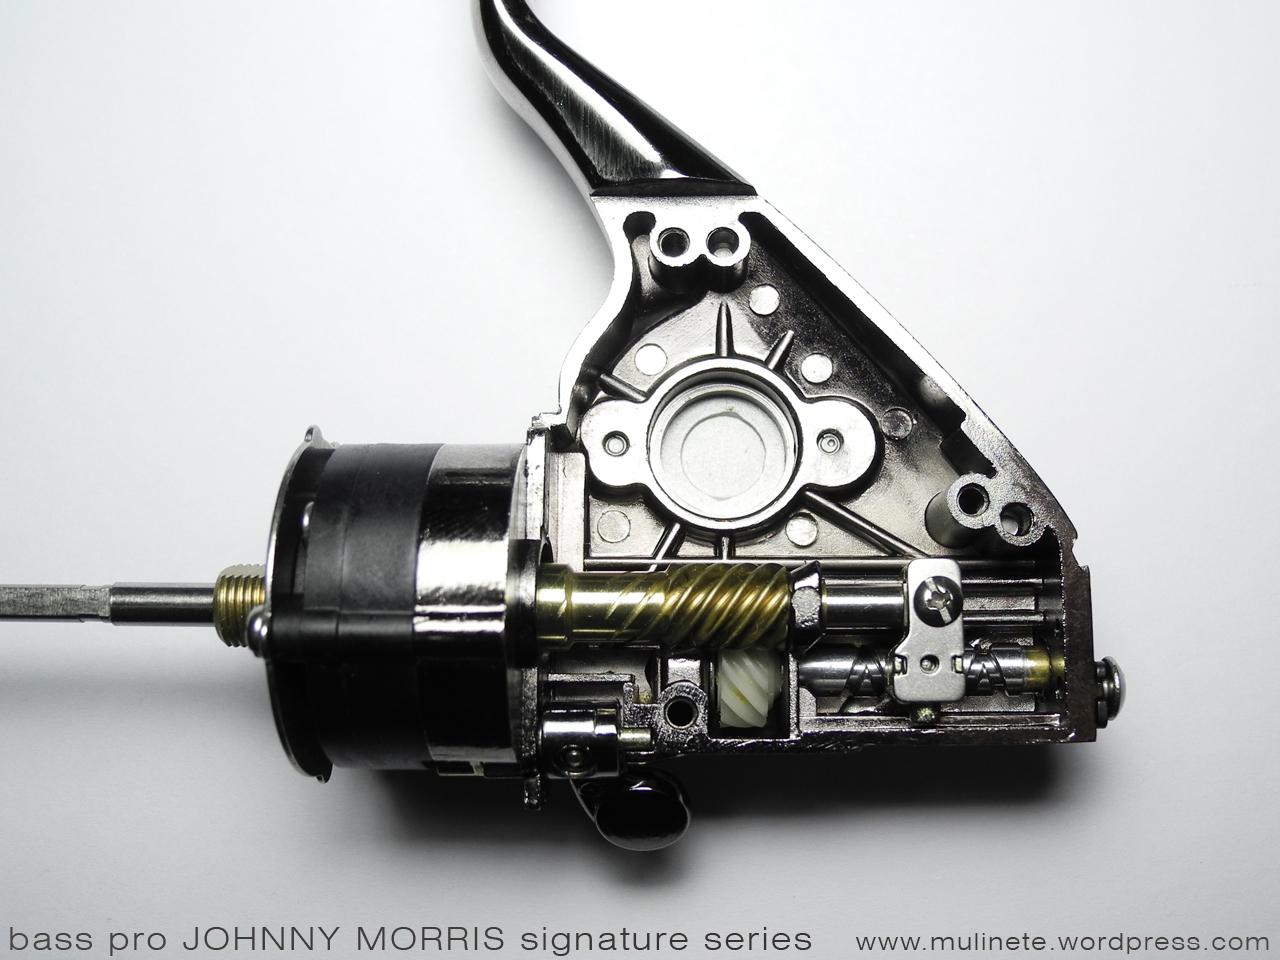 bass_pro_johnny_morris_signature_12.jpg